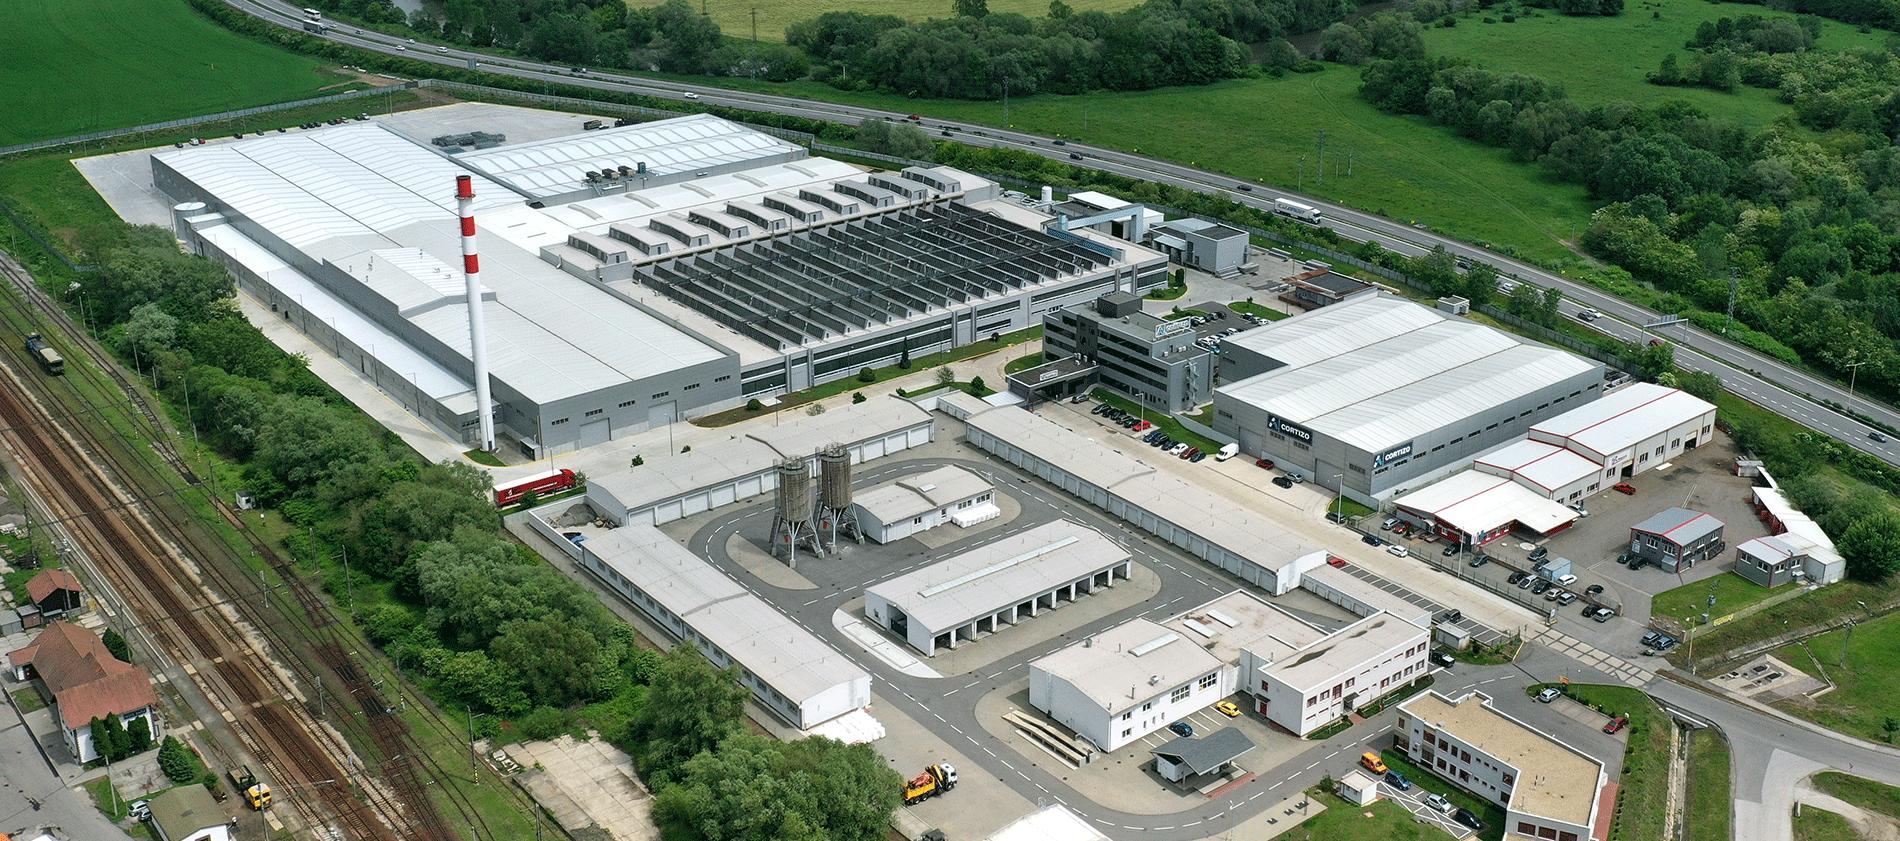 CORTIZO SLOVACIA CAPACITATE PRODUCTIVA 16.000 To/an  » 3 Prese de Extrudare » 2 Linii de Vositorie » Linii de Eloxare » 3 Centre de Mecanizare » Suprafata 32.000 m²